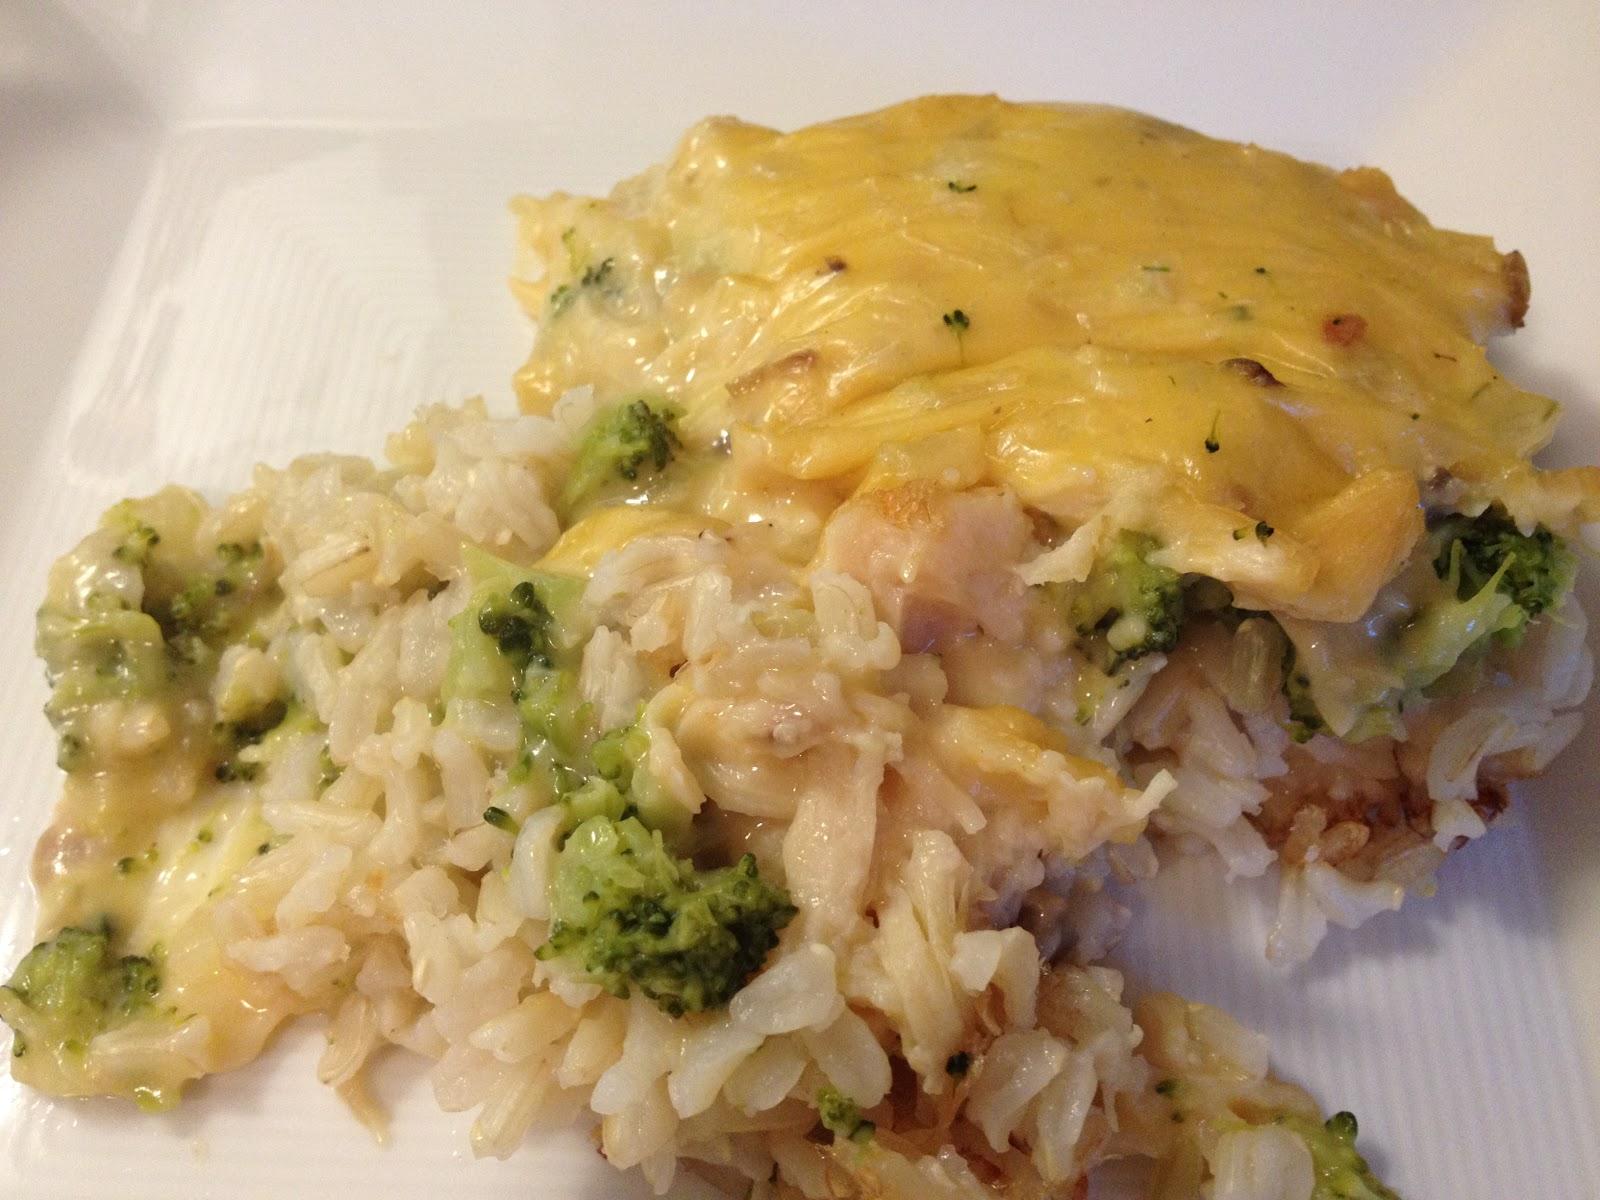 chicken broccoli cheese rice casserole